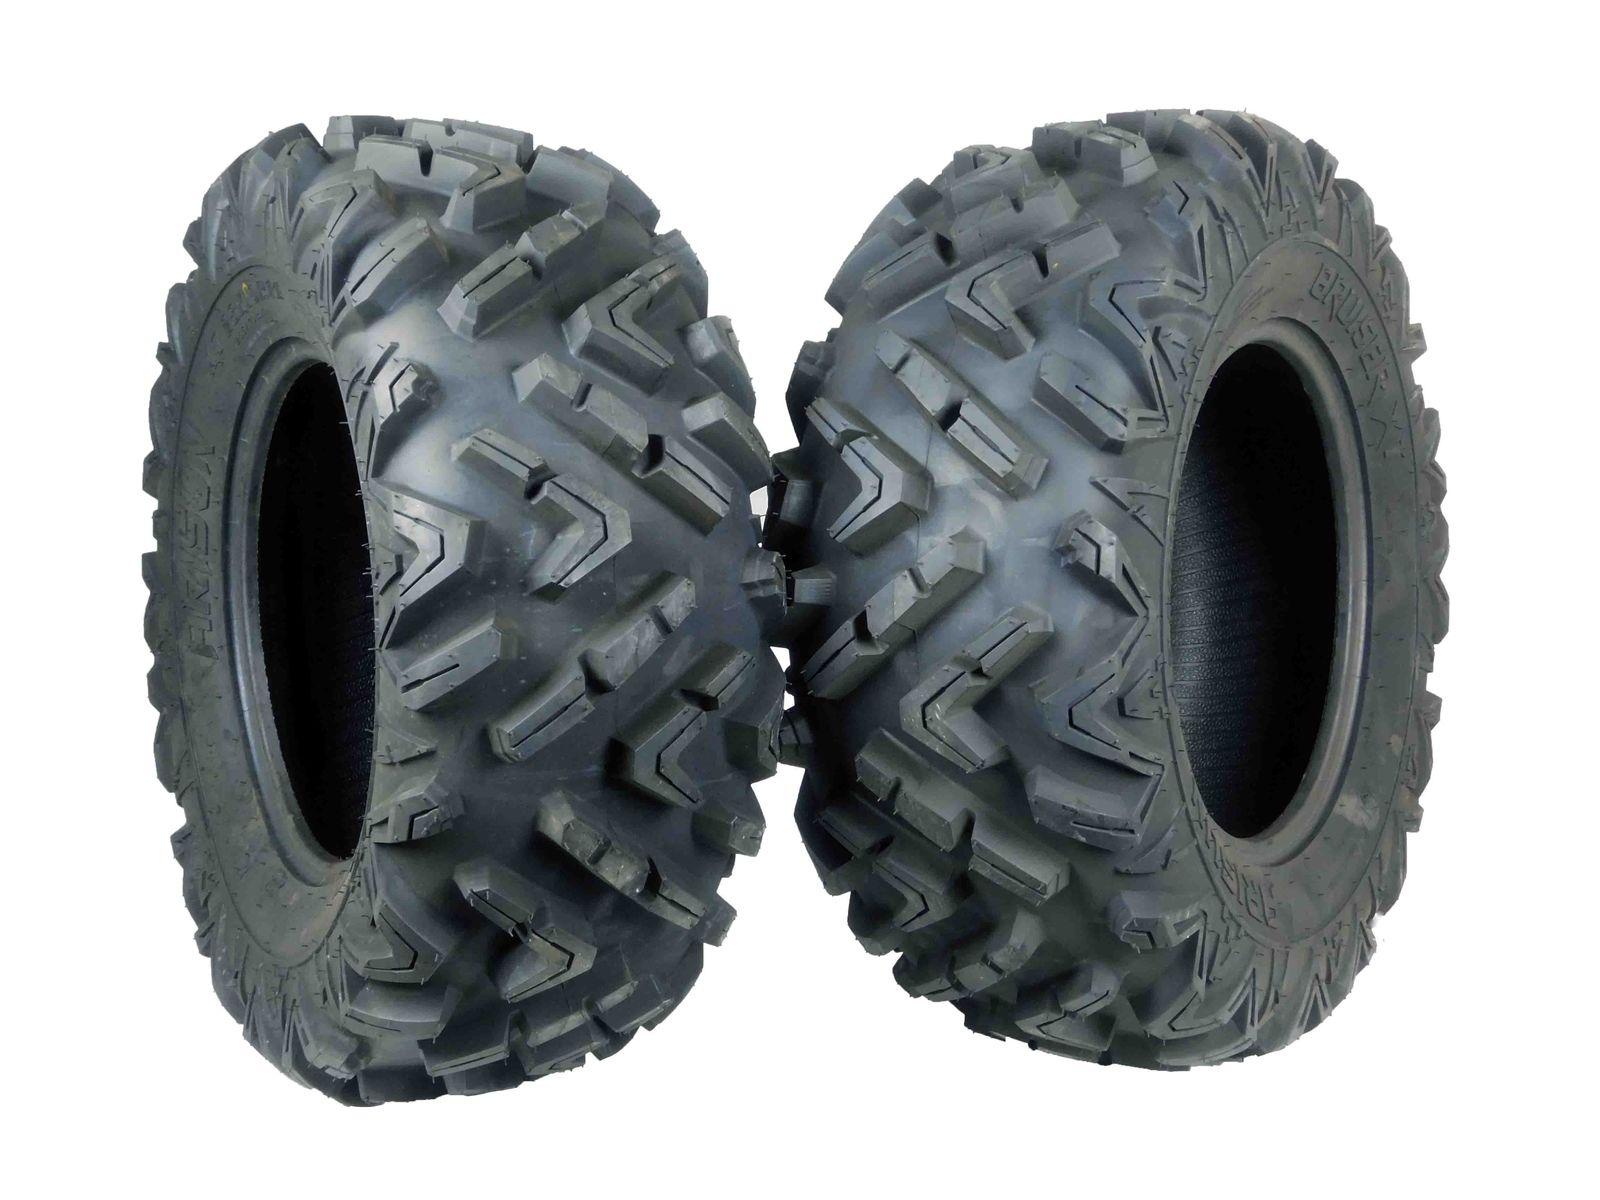 Arisun-28x10-14-Tires-Bruiser-XT-RADIAL-8ply-255-70R14-N4D-Protection-image-1